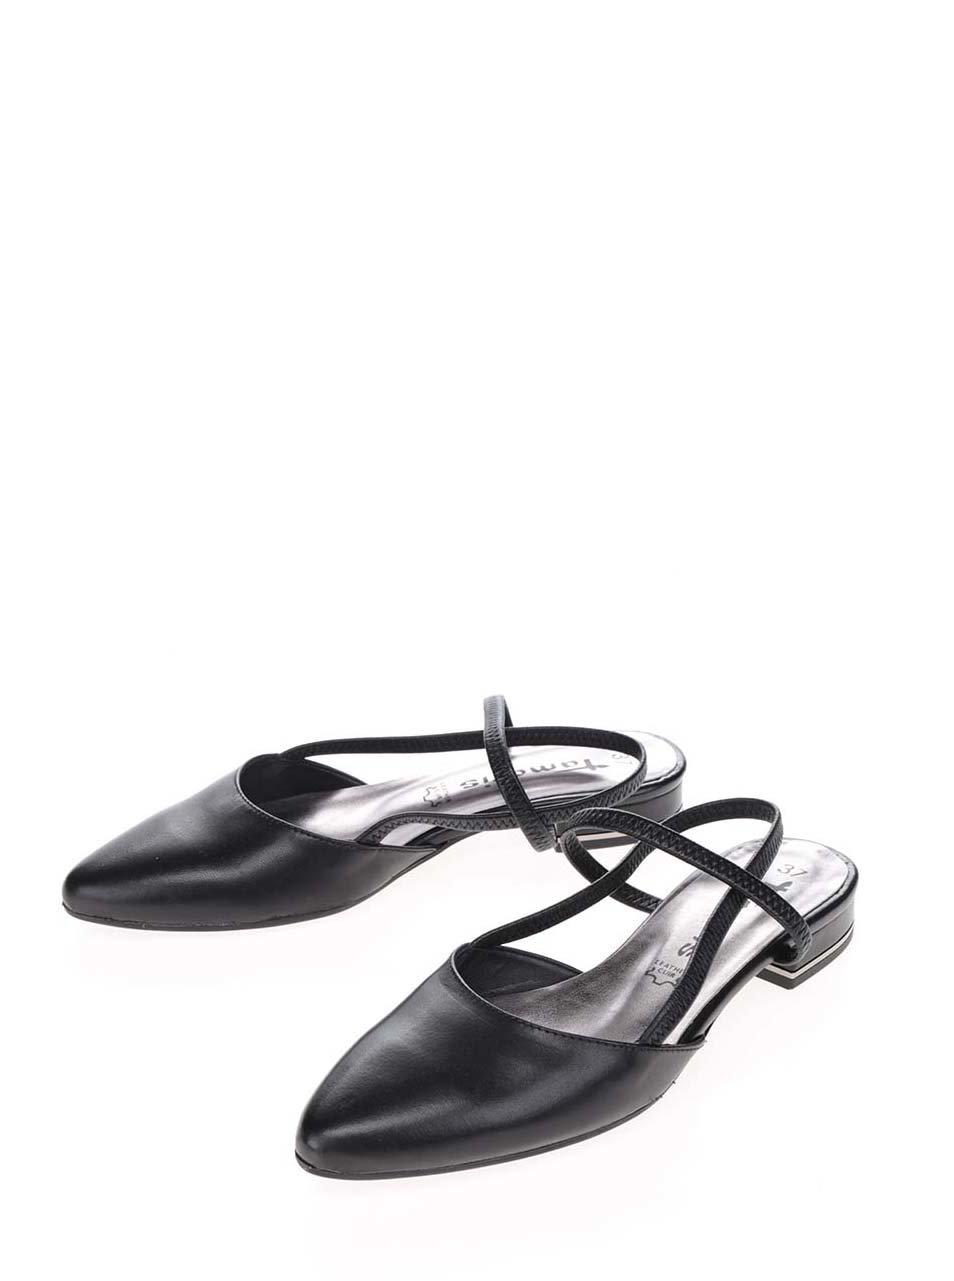 bdef16321c97 Čierne kožené sandále s uzavretou špičkou Tamaris ...